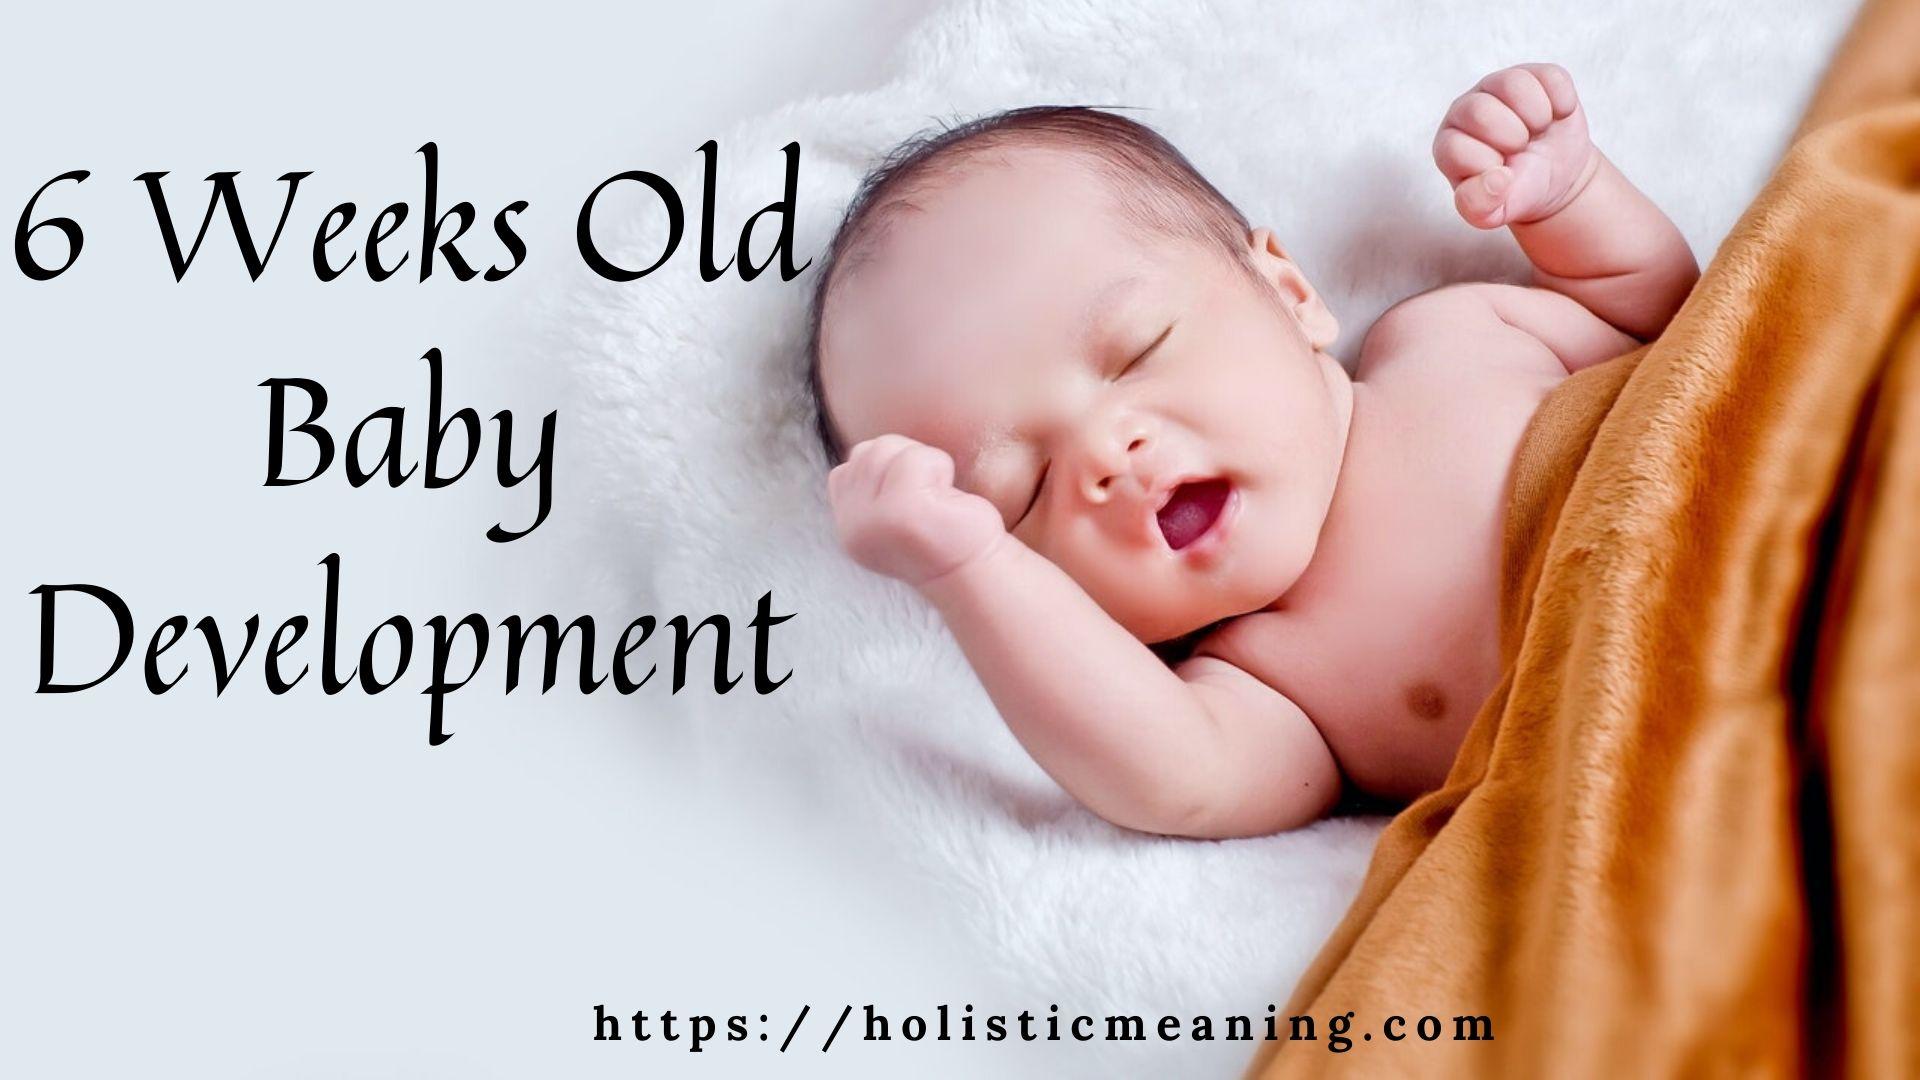 6 Weeks Old Baby Development